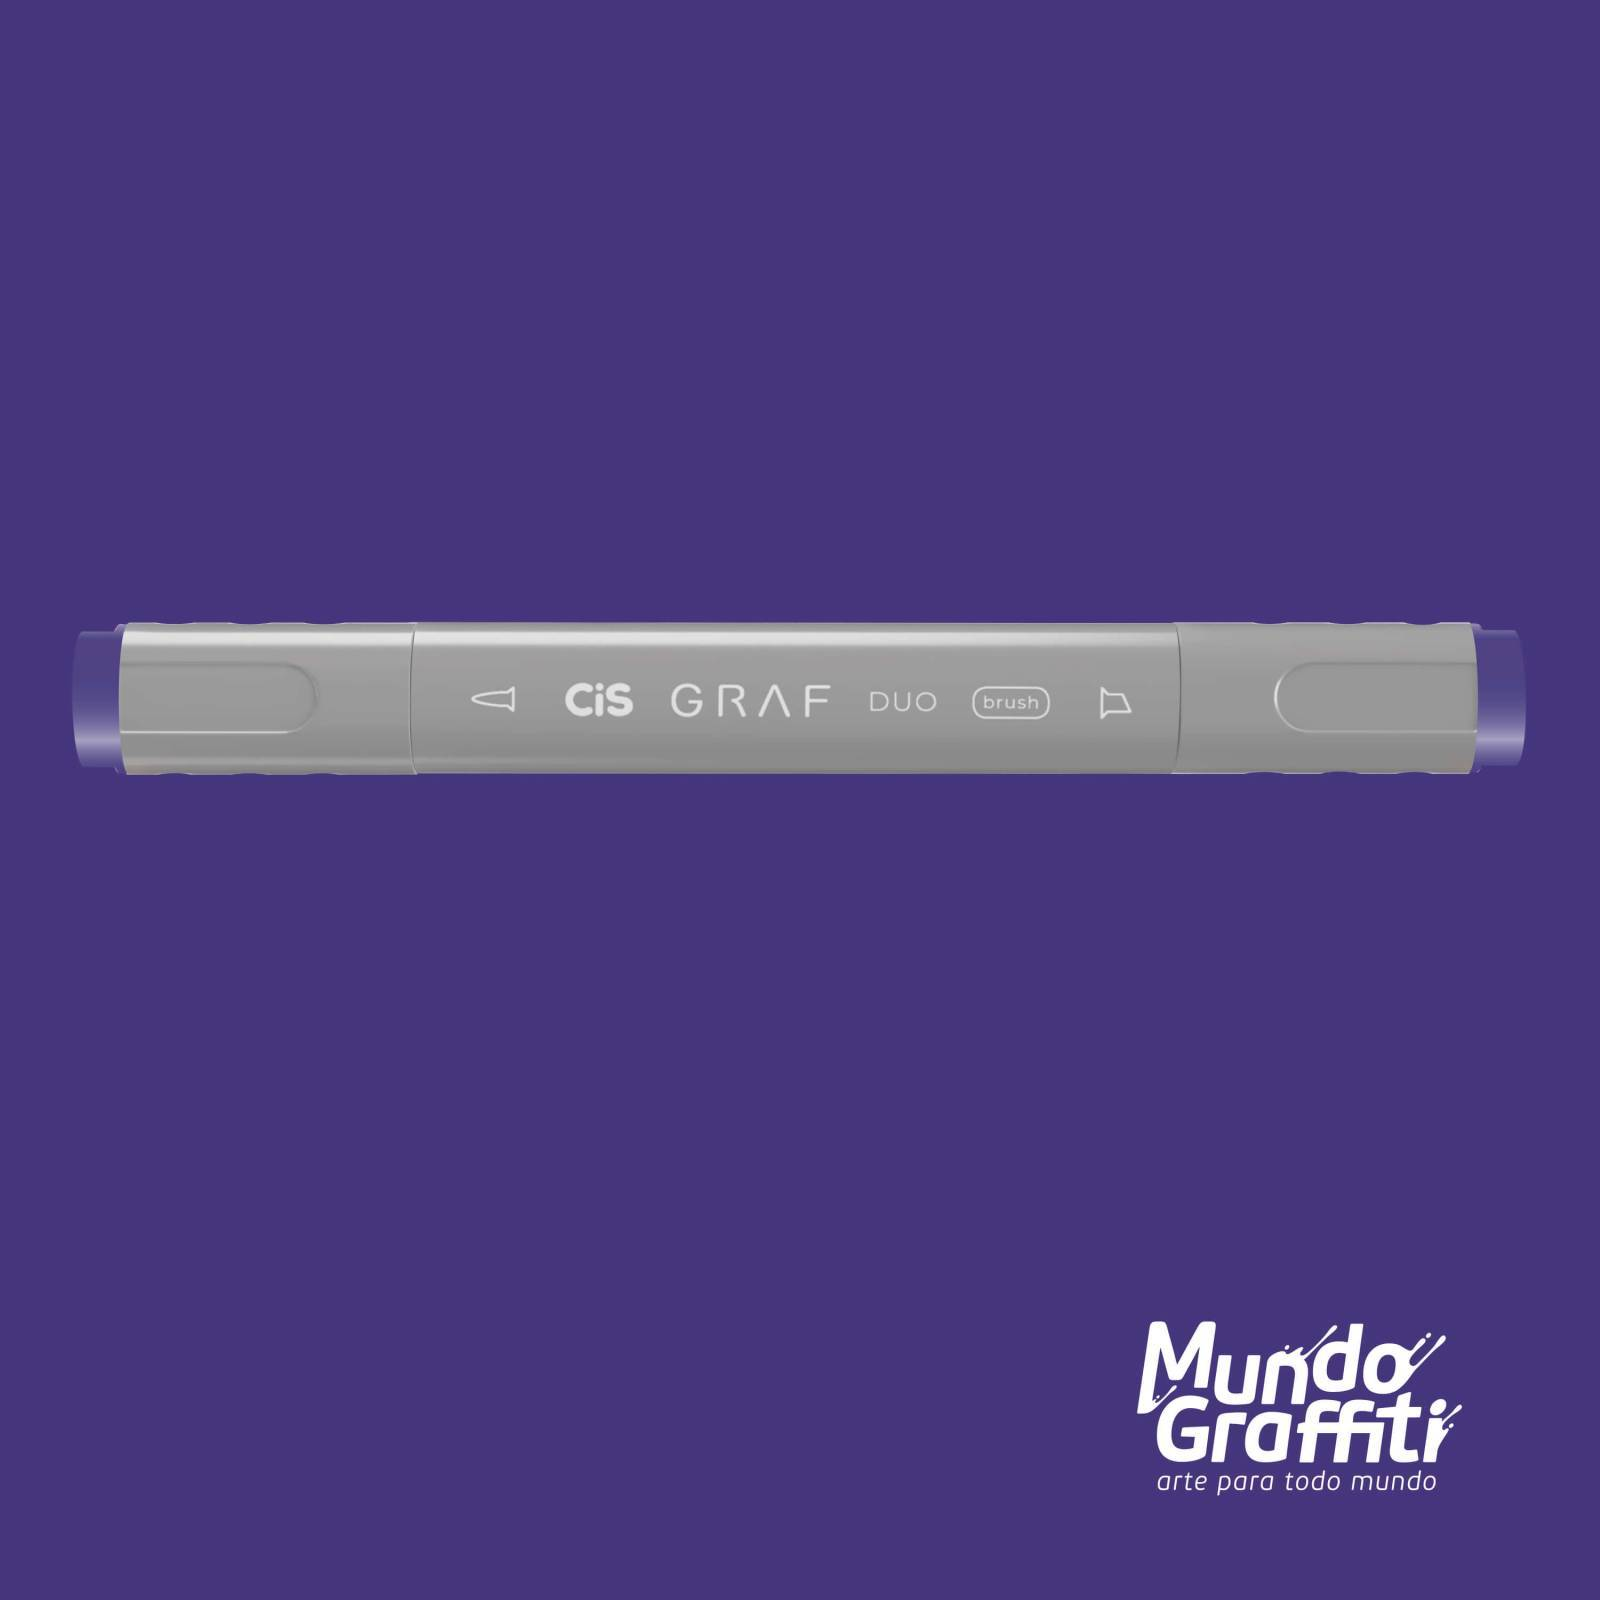 Marcador Cis Graf Duo Brush Lavender 83 - Mundo Graffiti